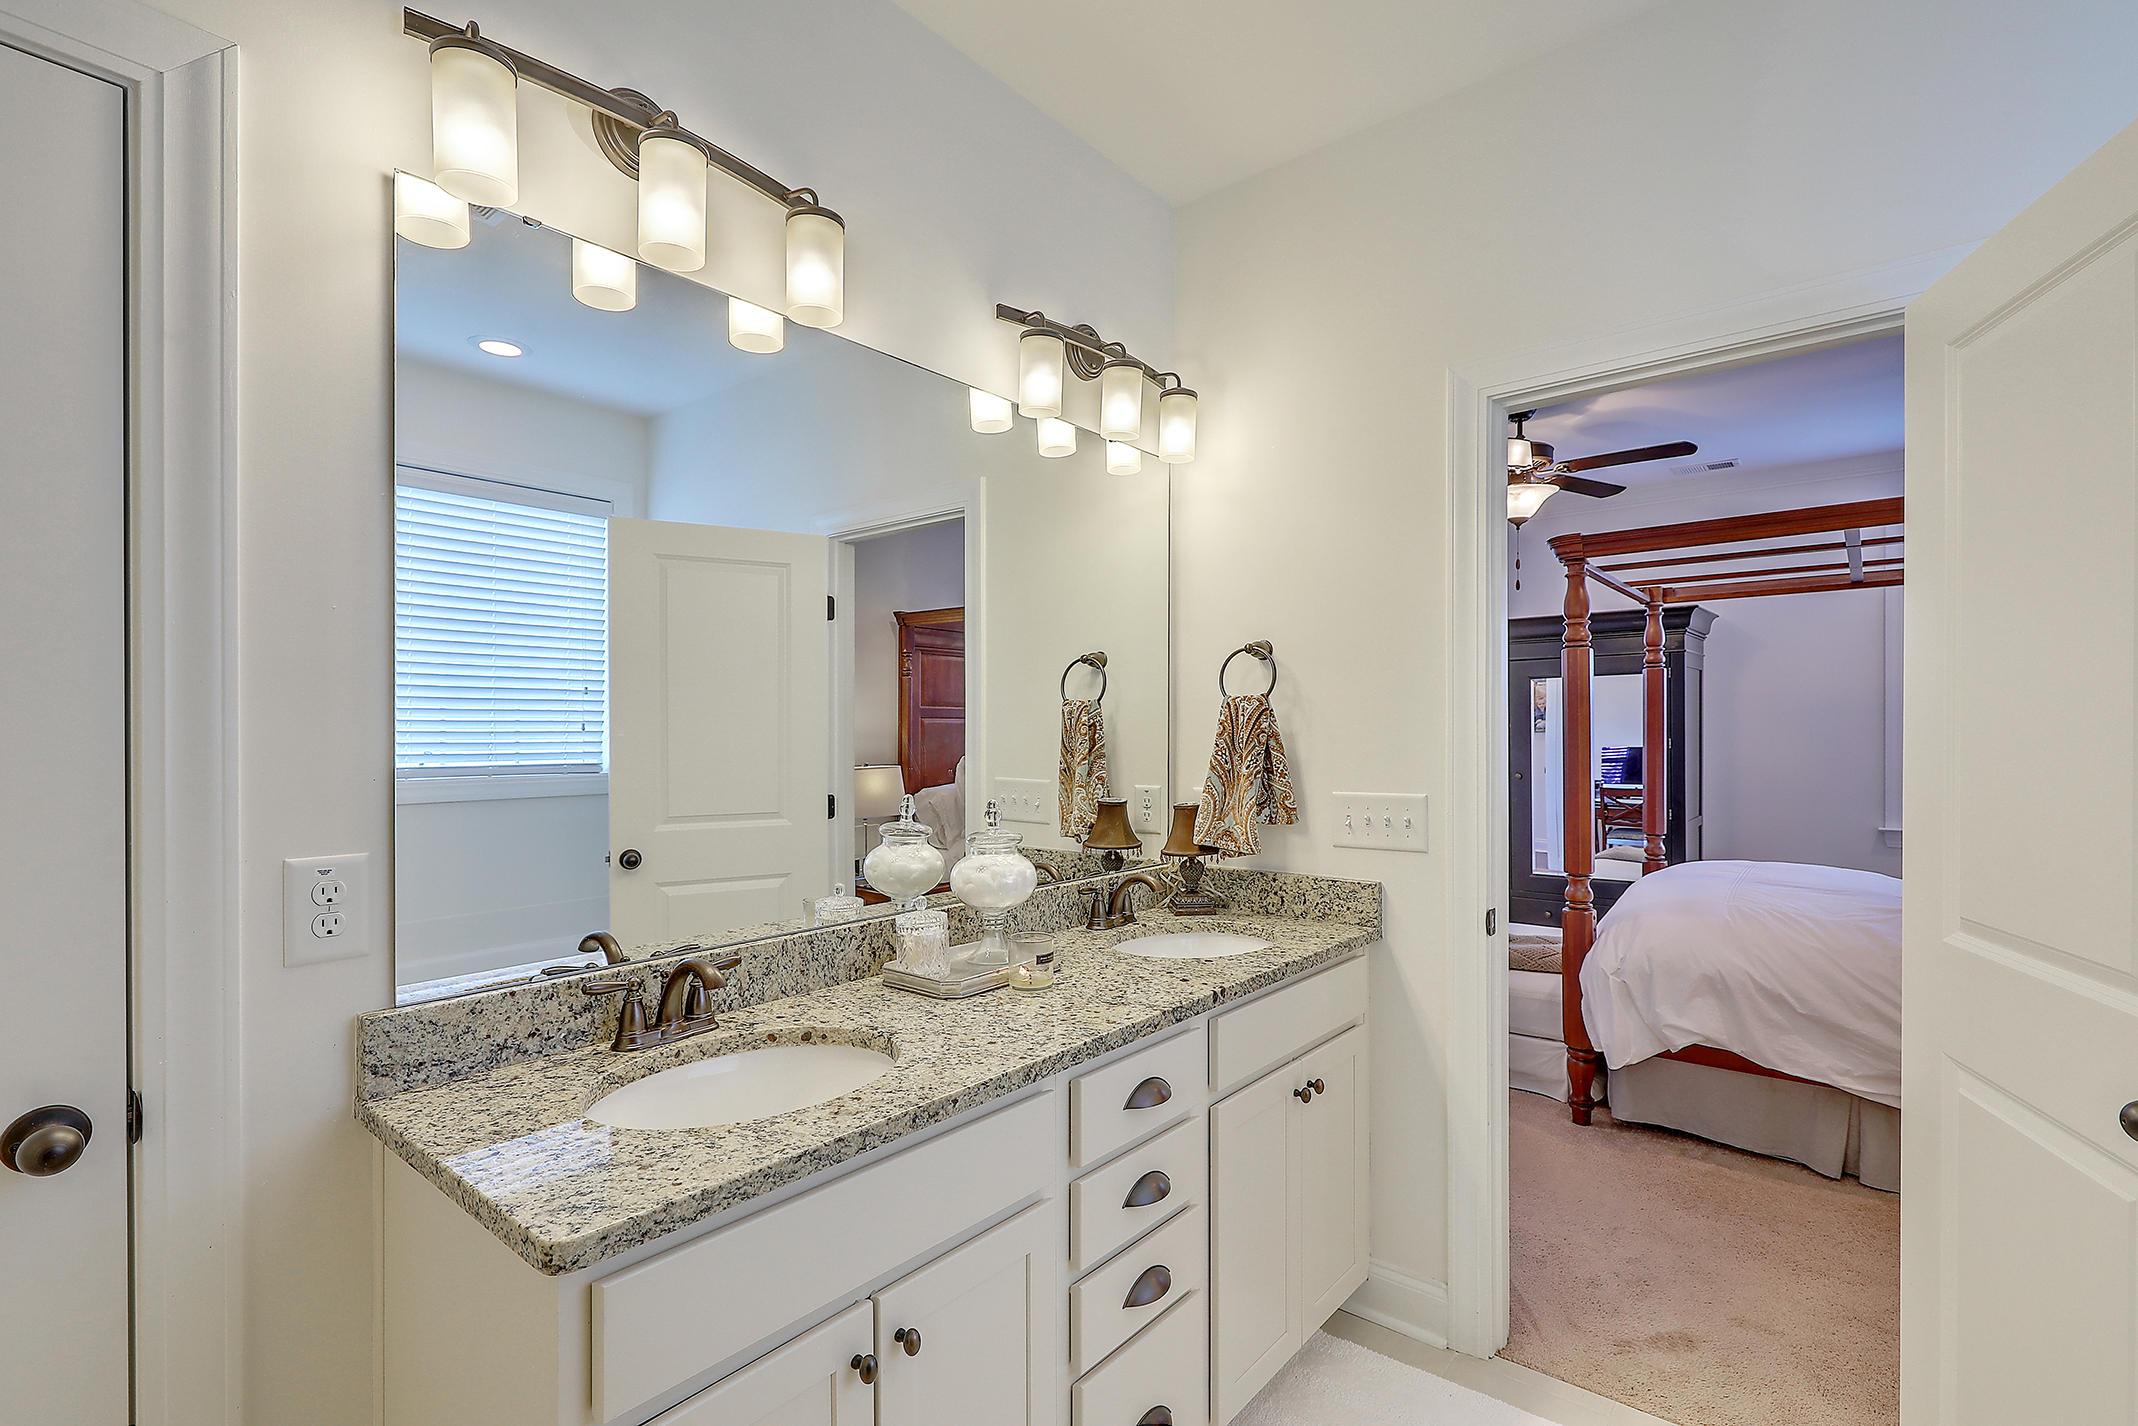 Park West Homes For Sale - 3412 Salterbeck, Mount Pleasant, SC - 17